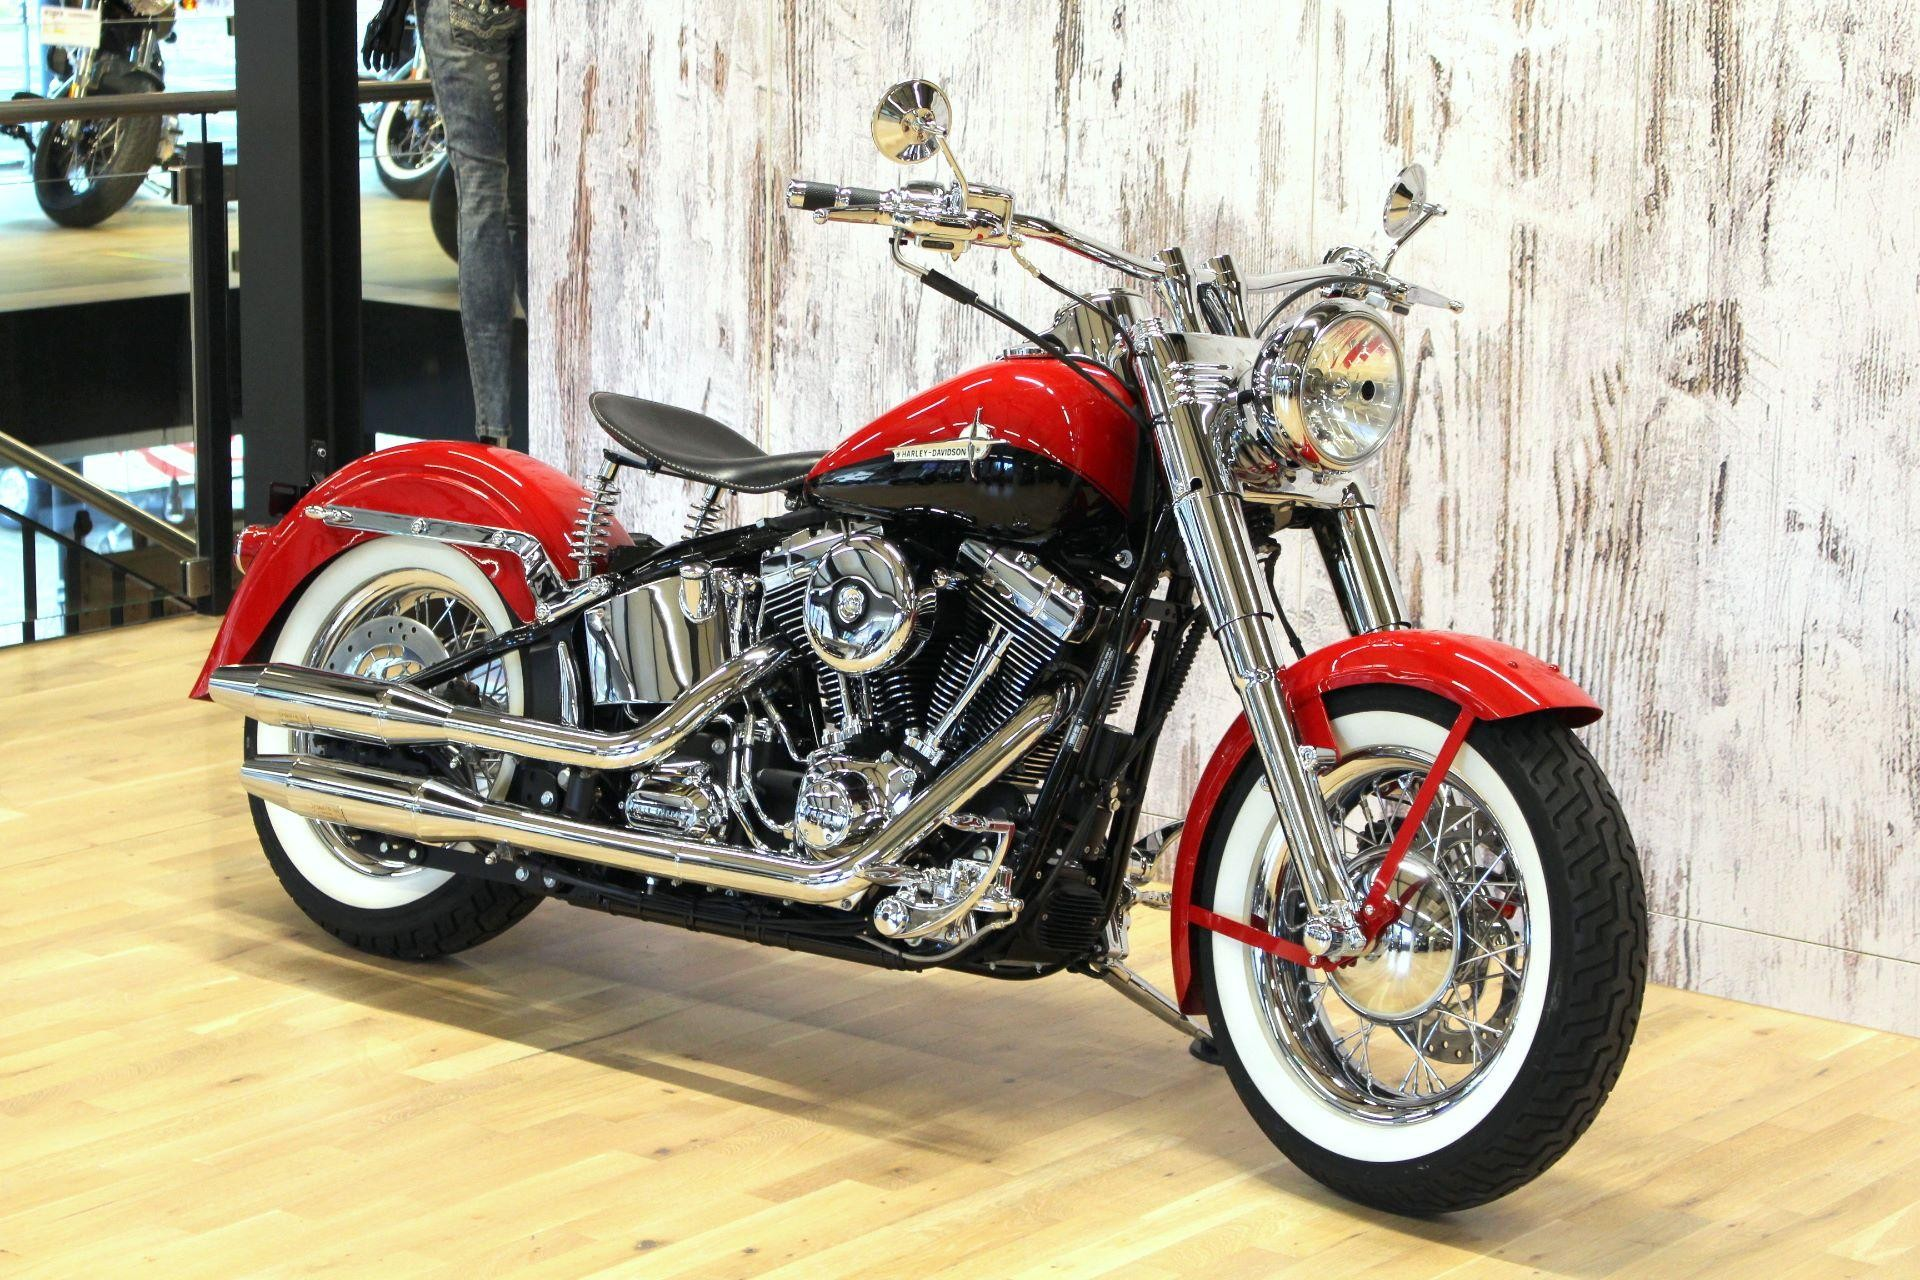 Harley Davidson Softail Deluxe Price